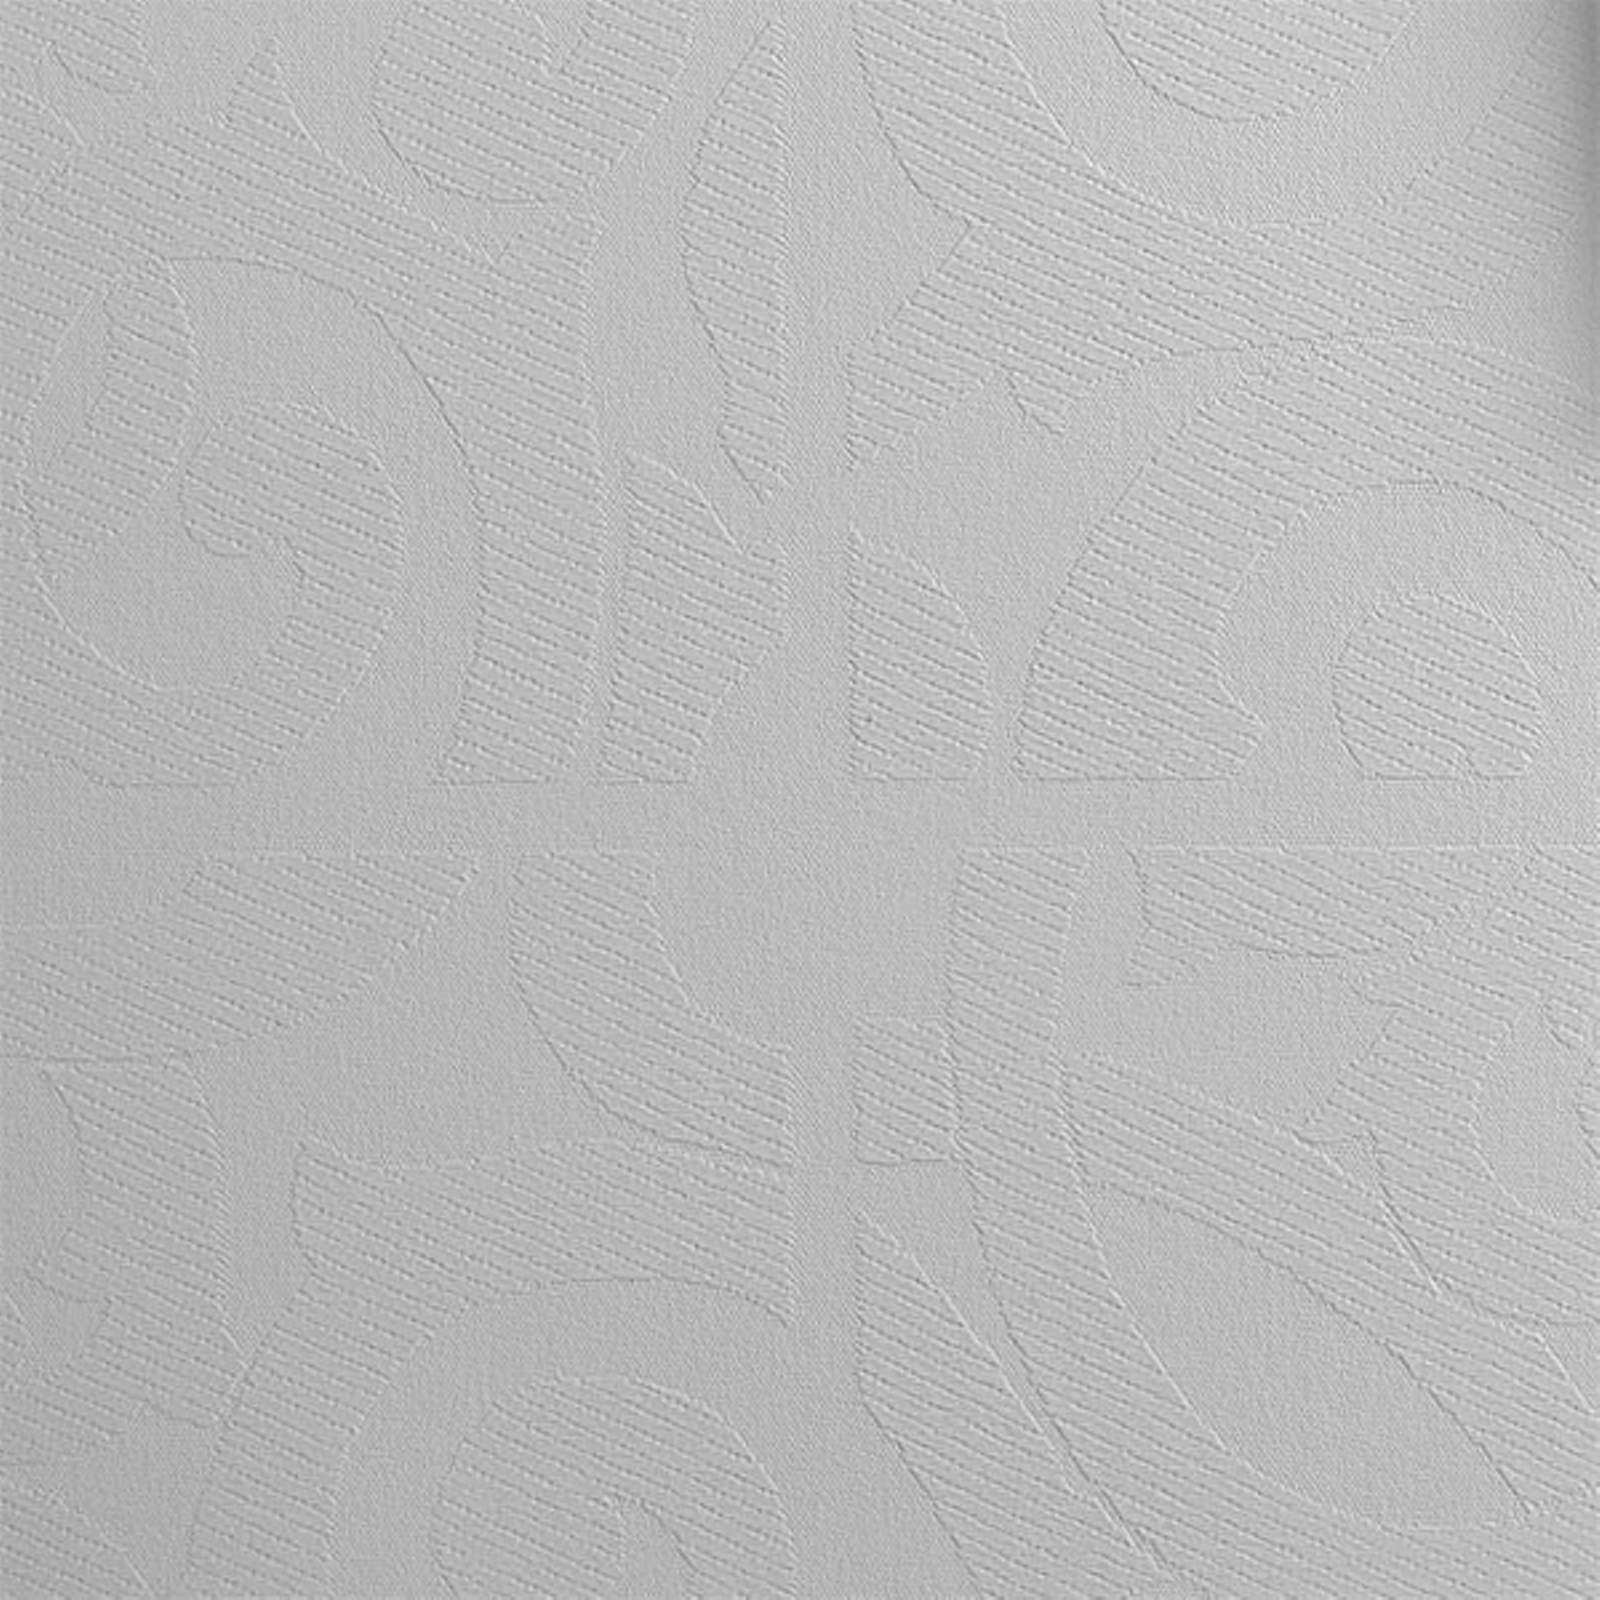 Стеклообои Wellton Decor Витраж WD760